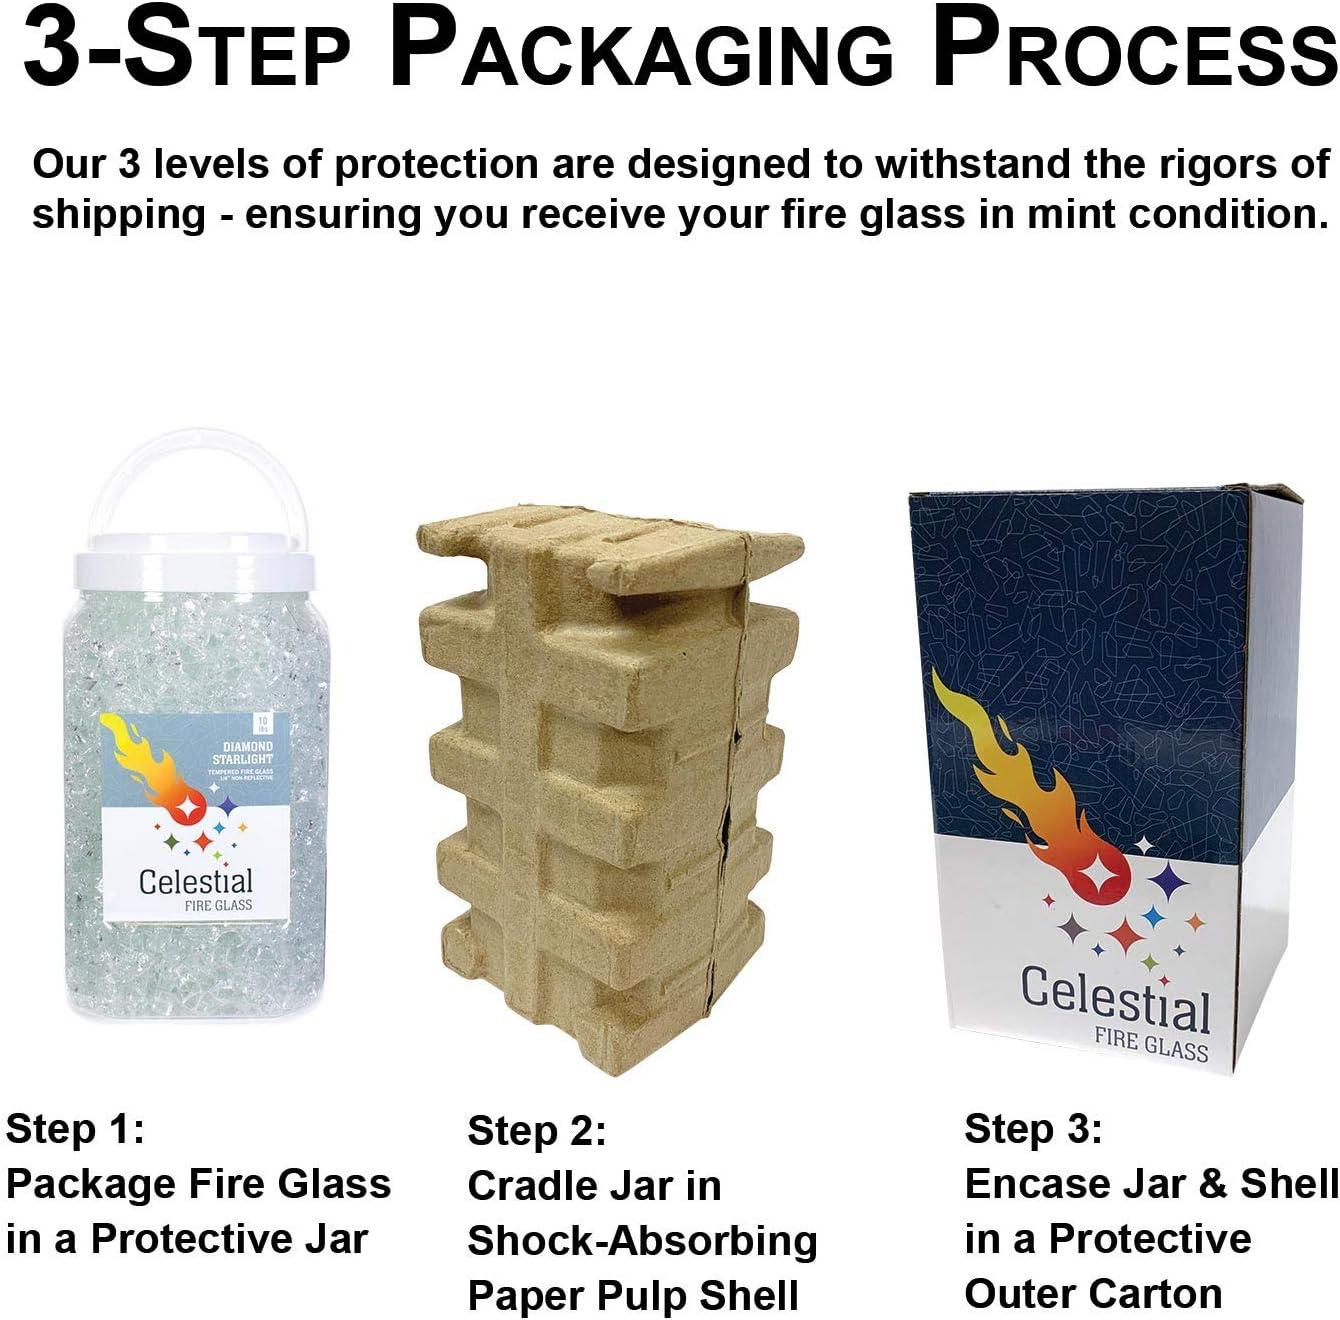 Celestial Fire Glass 2 oz Sample Diamond Starlight 1//2 Ultra Clear Tempered Fire Glass